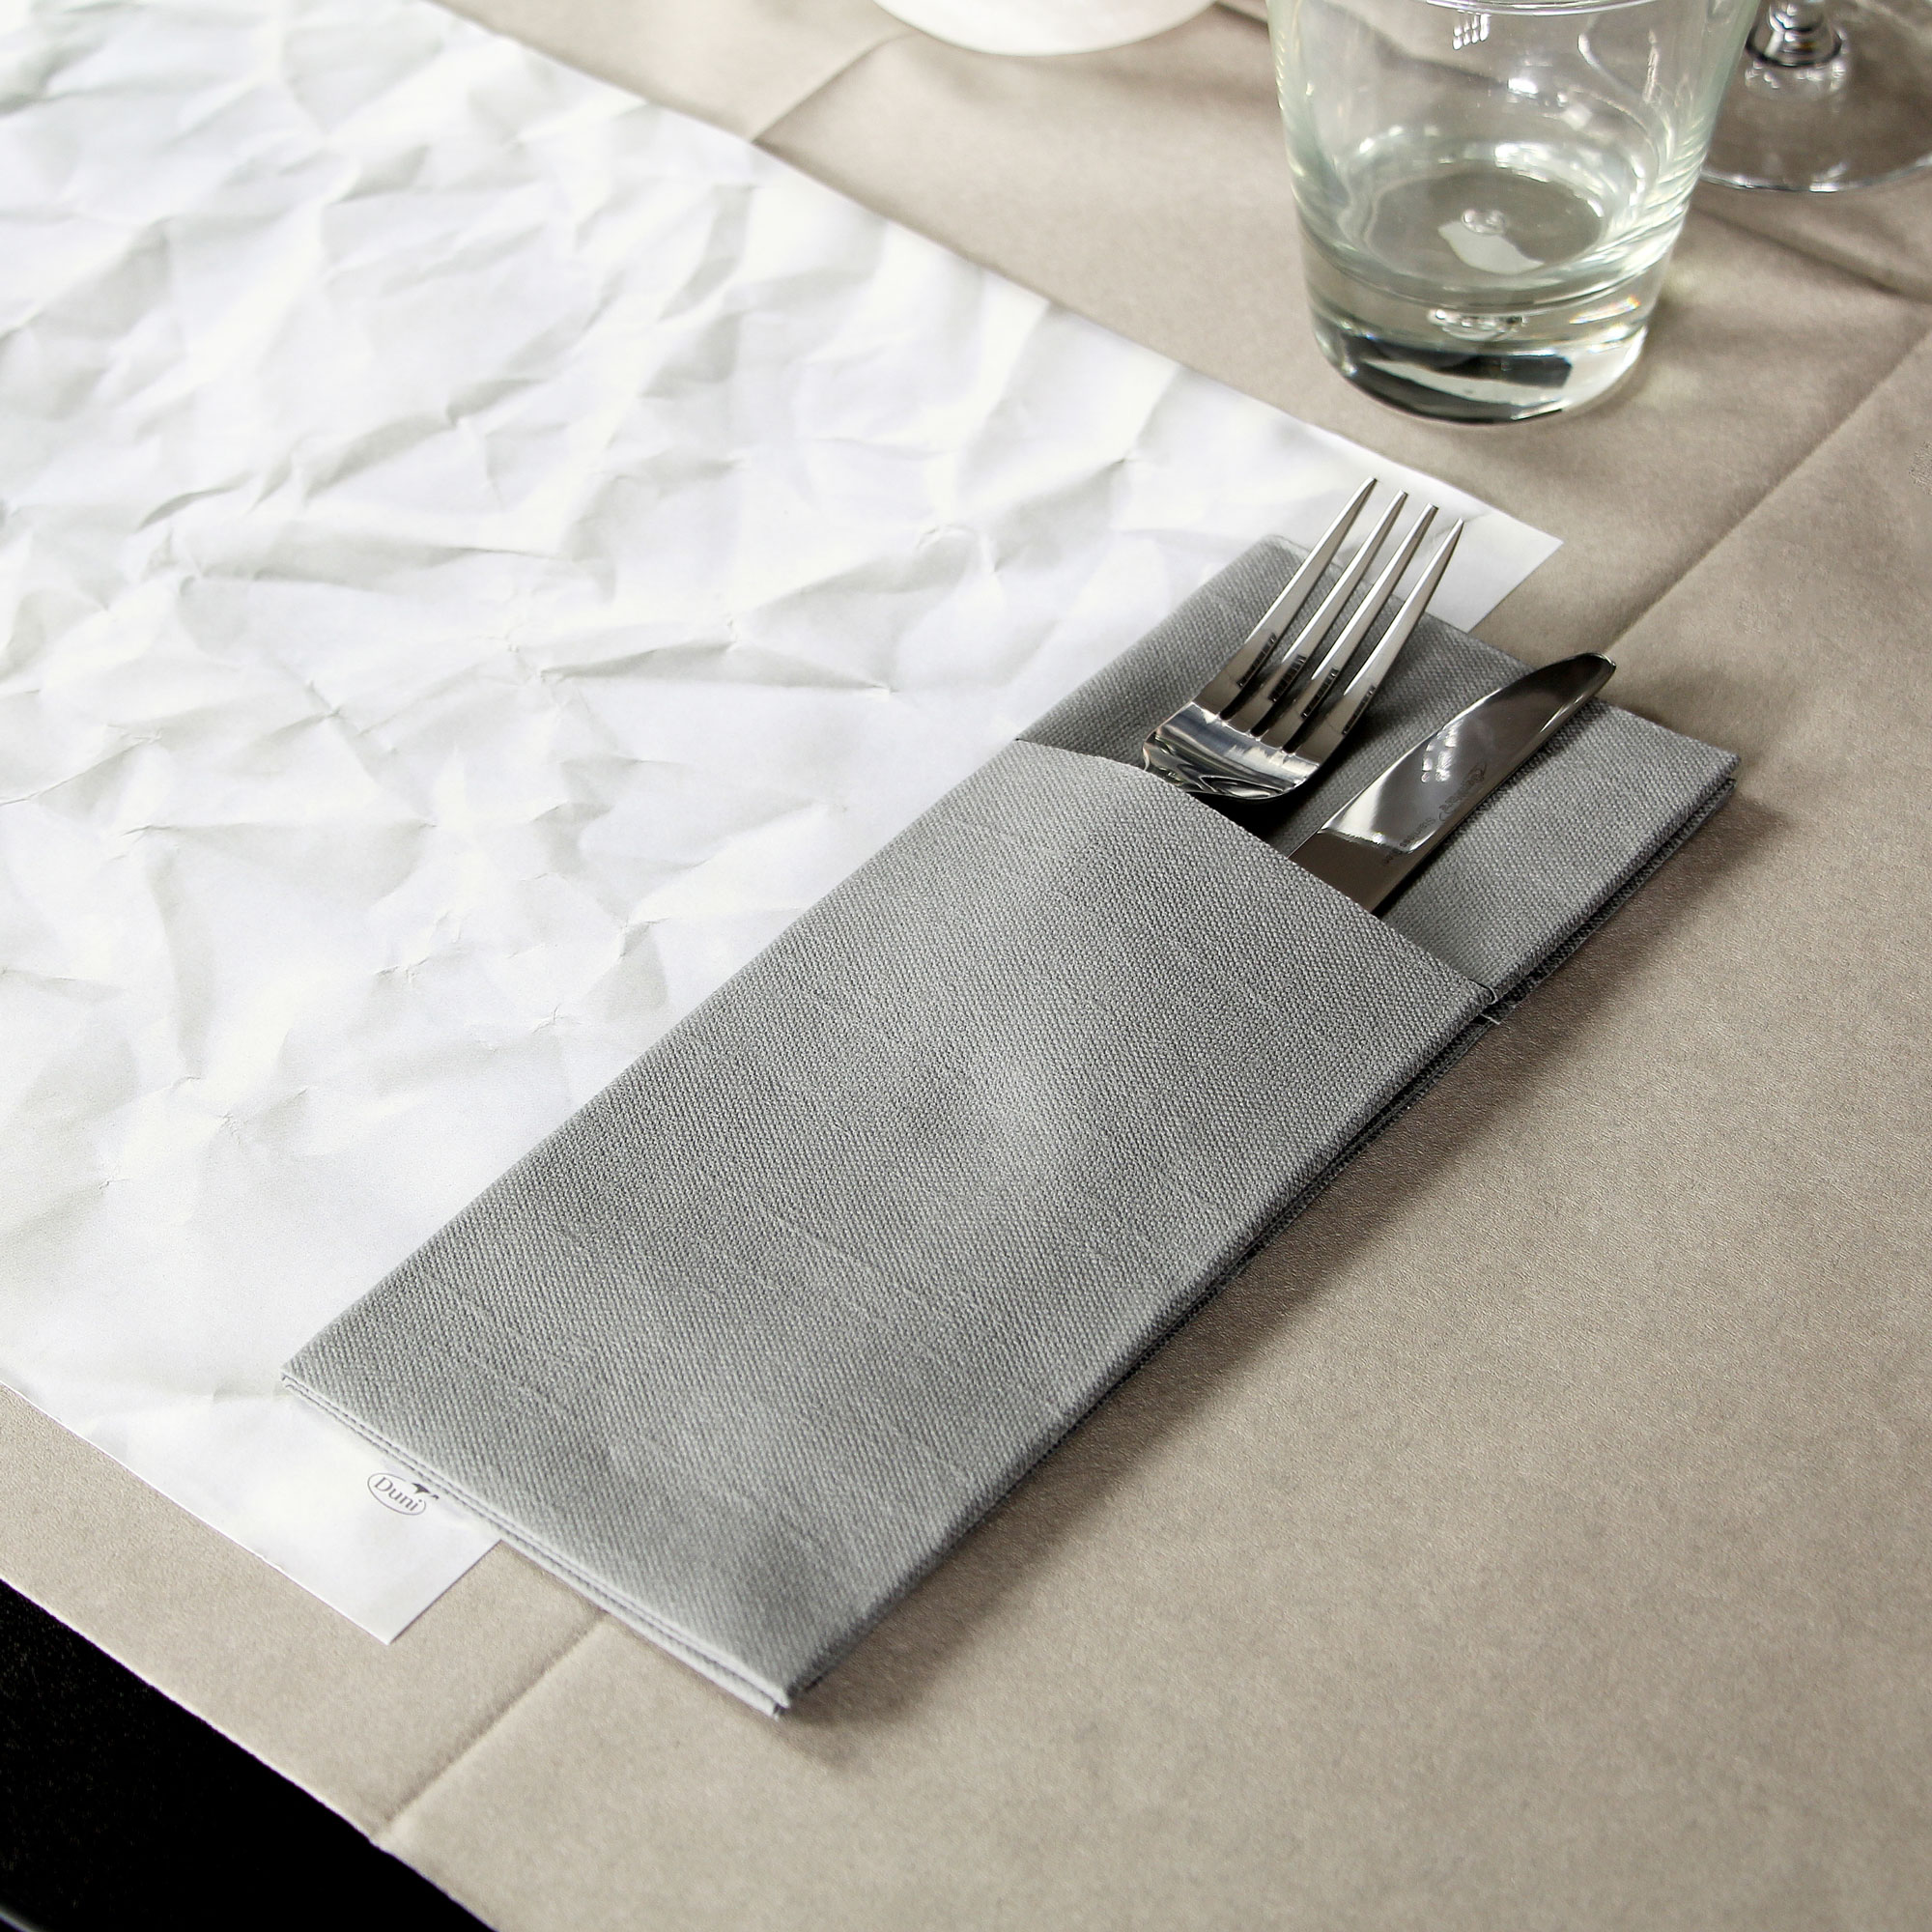 Duniletto Napkin Pockets Granite Grey 40 x 48cm & Duni Duniletto Grey Napkin Pocket Cutlery Holder 40 x 48cm